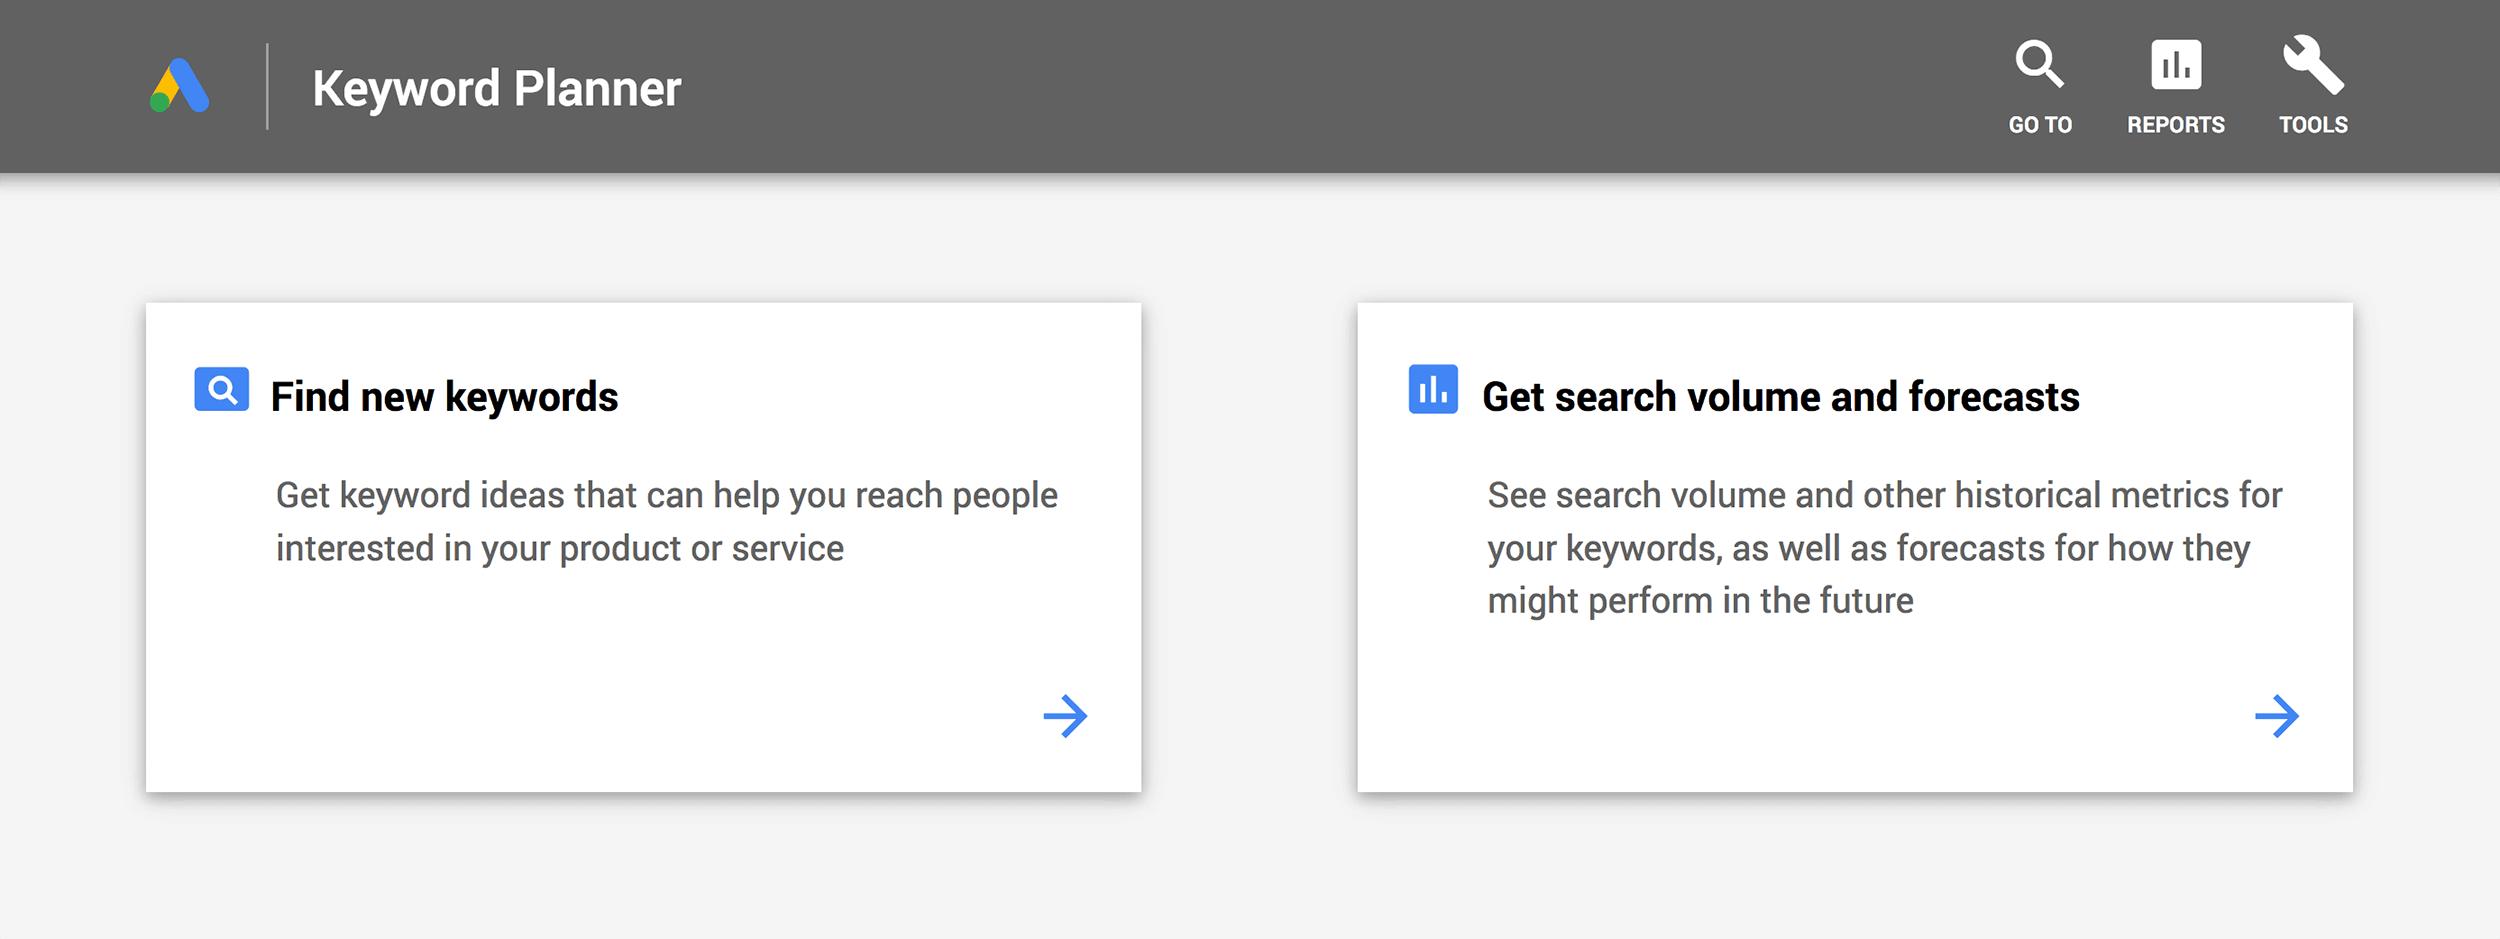 1585025606 5524 google keyword planner 1